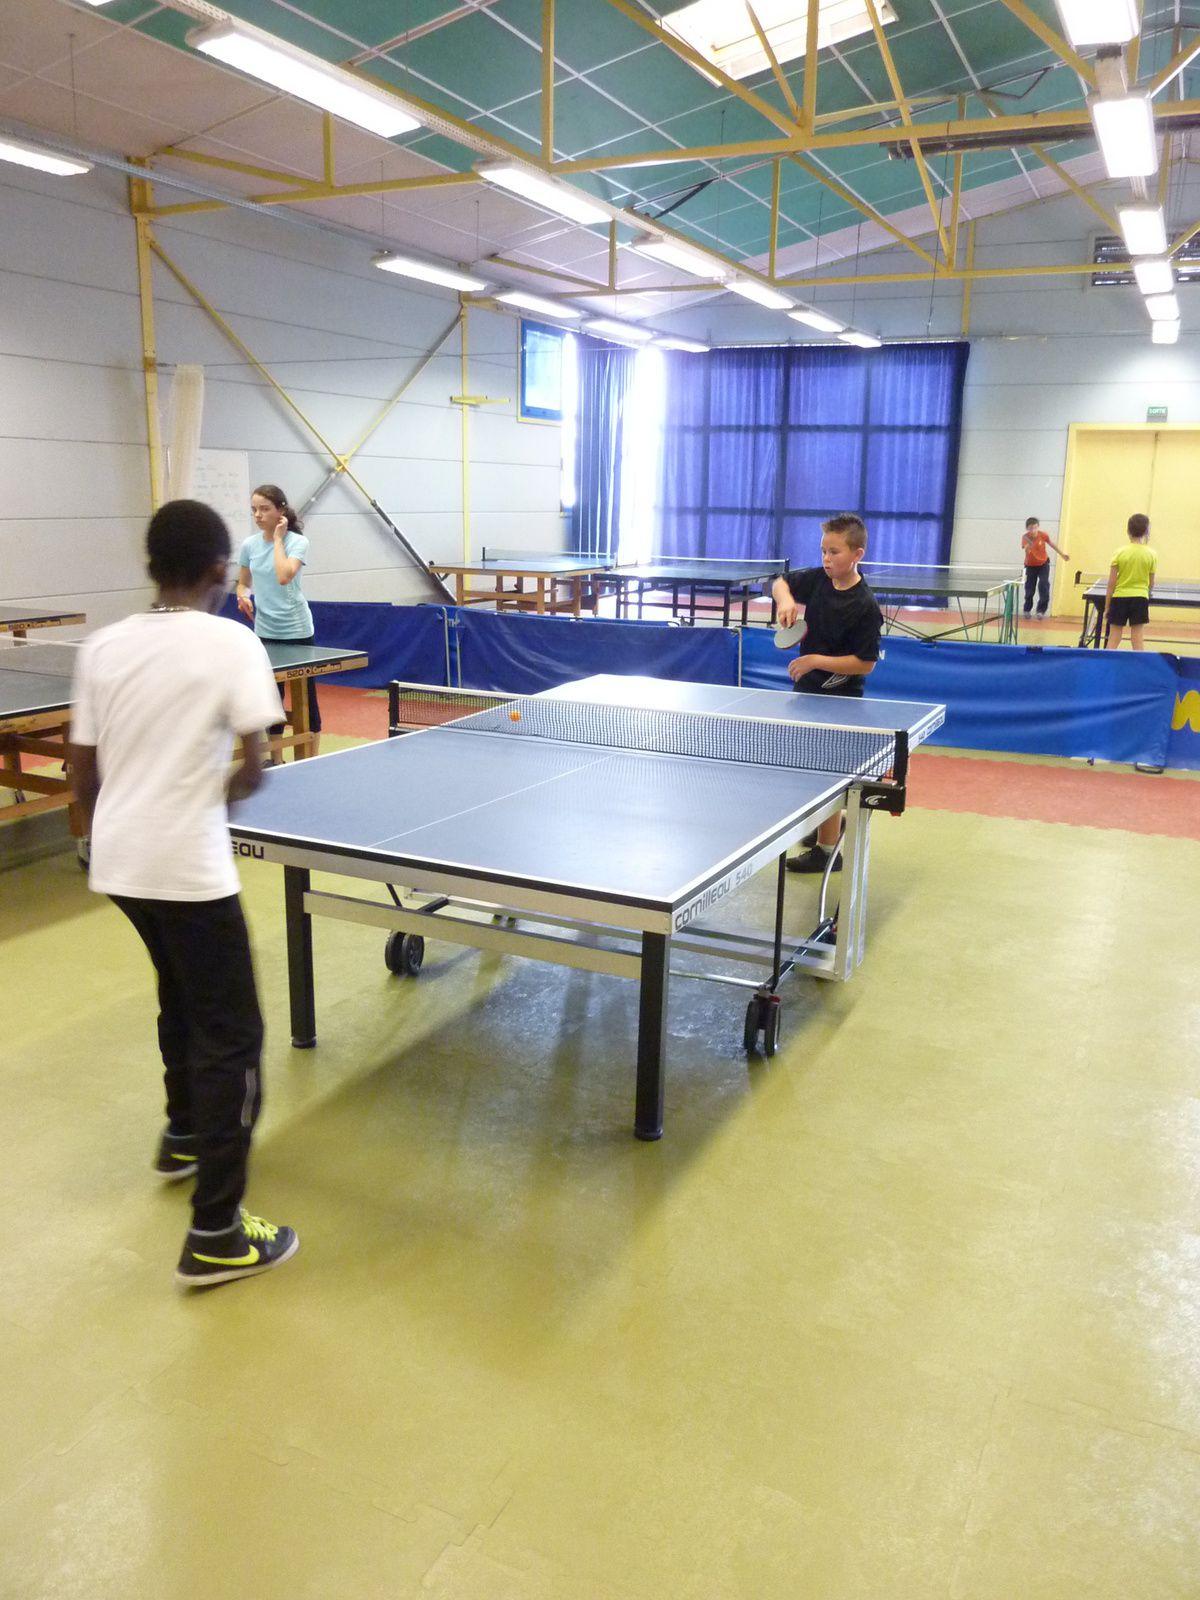 Journée Formation Jeunes Arbitres (Handball, Tennis de Table)